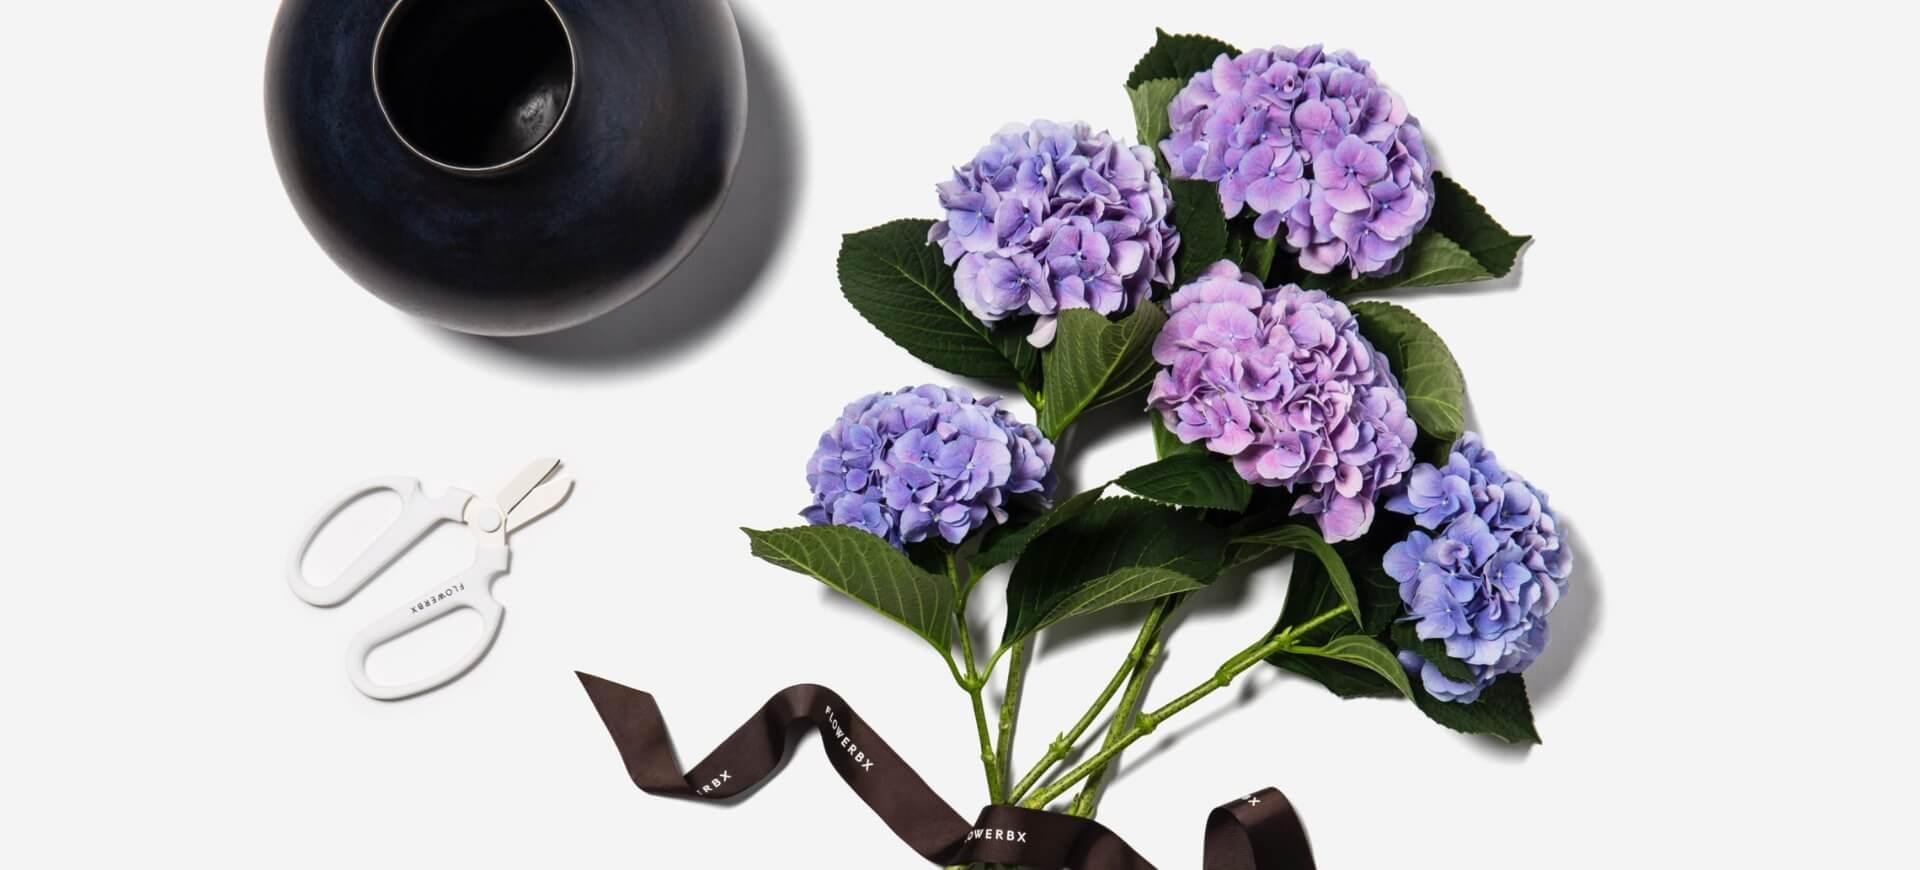 Image of purple flowers by FLOWERBX